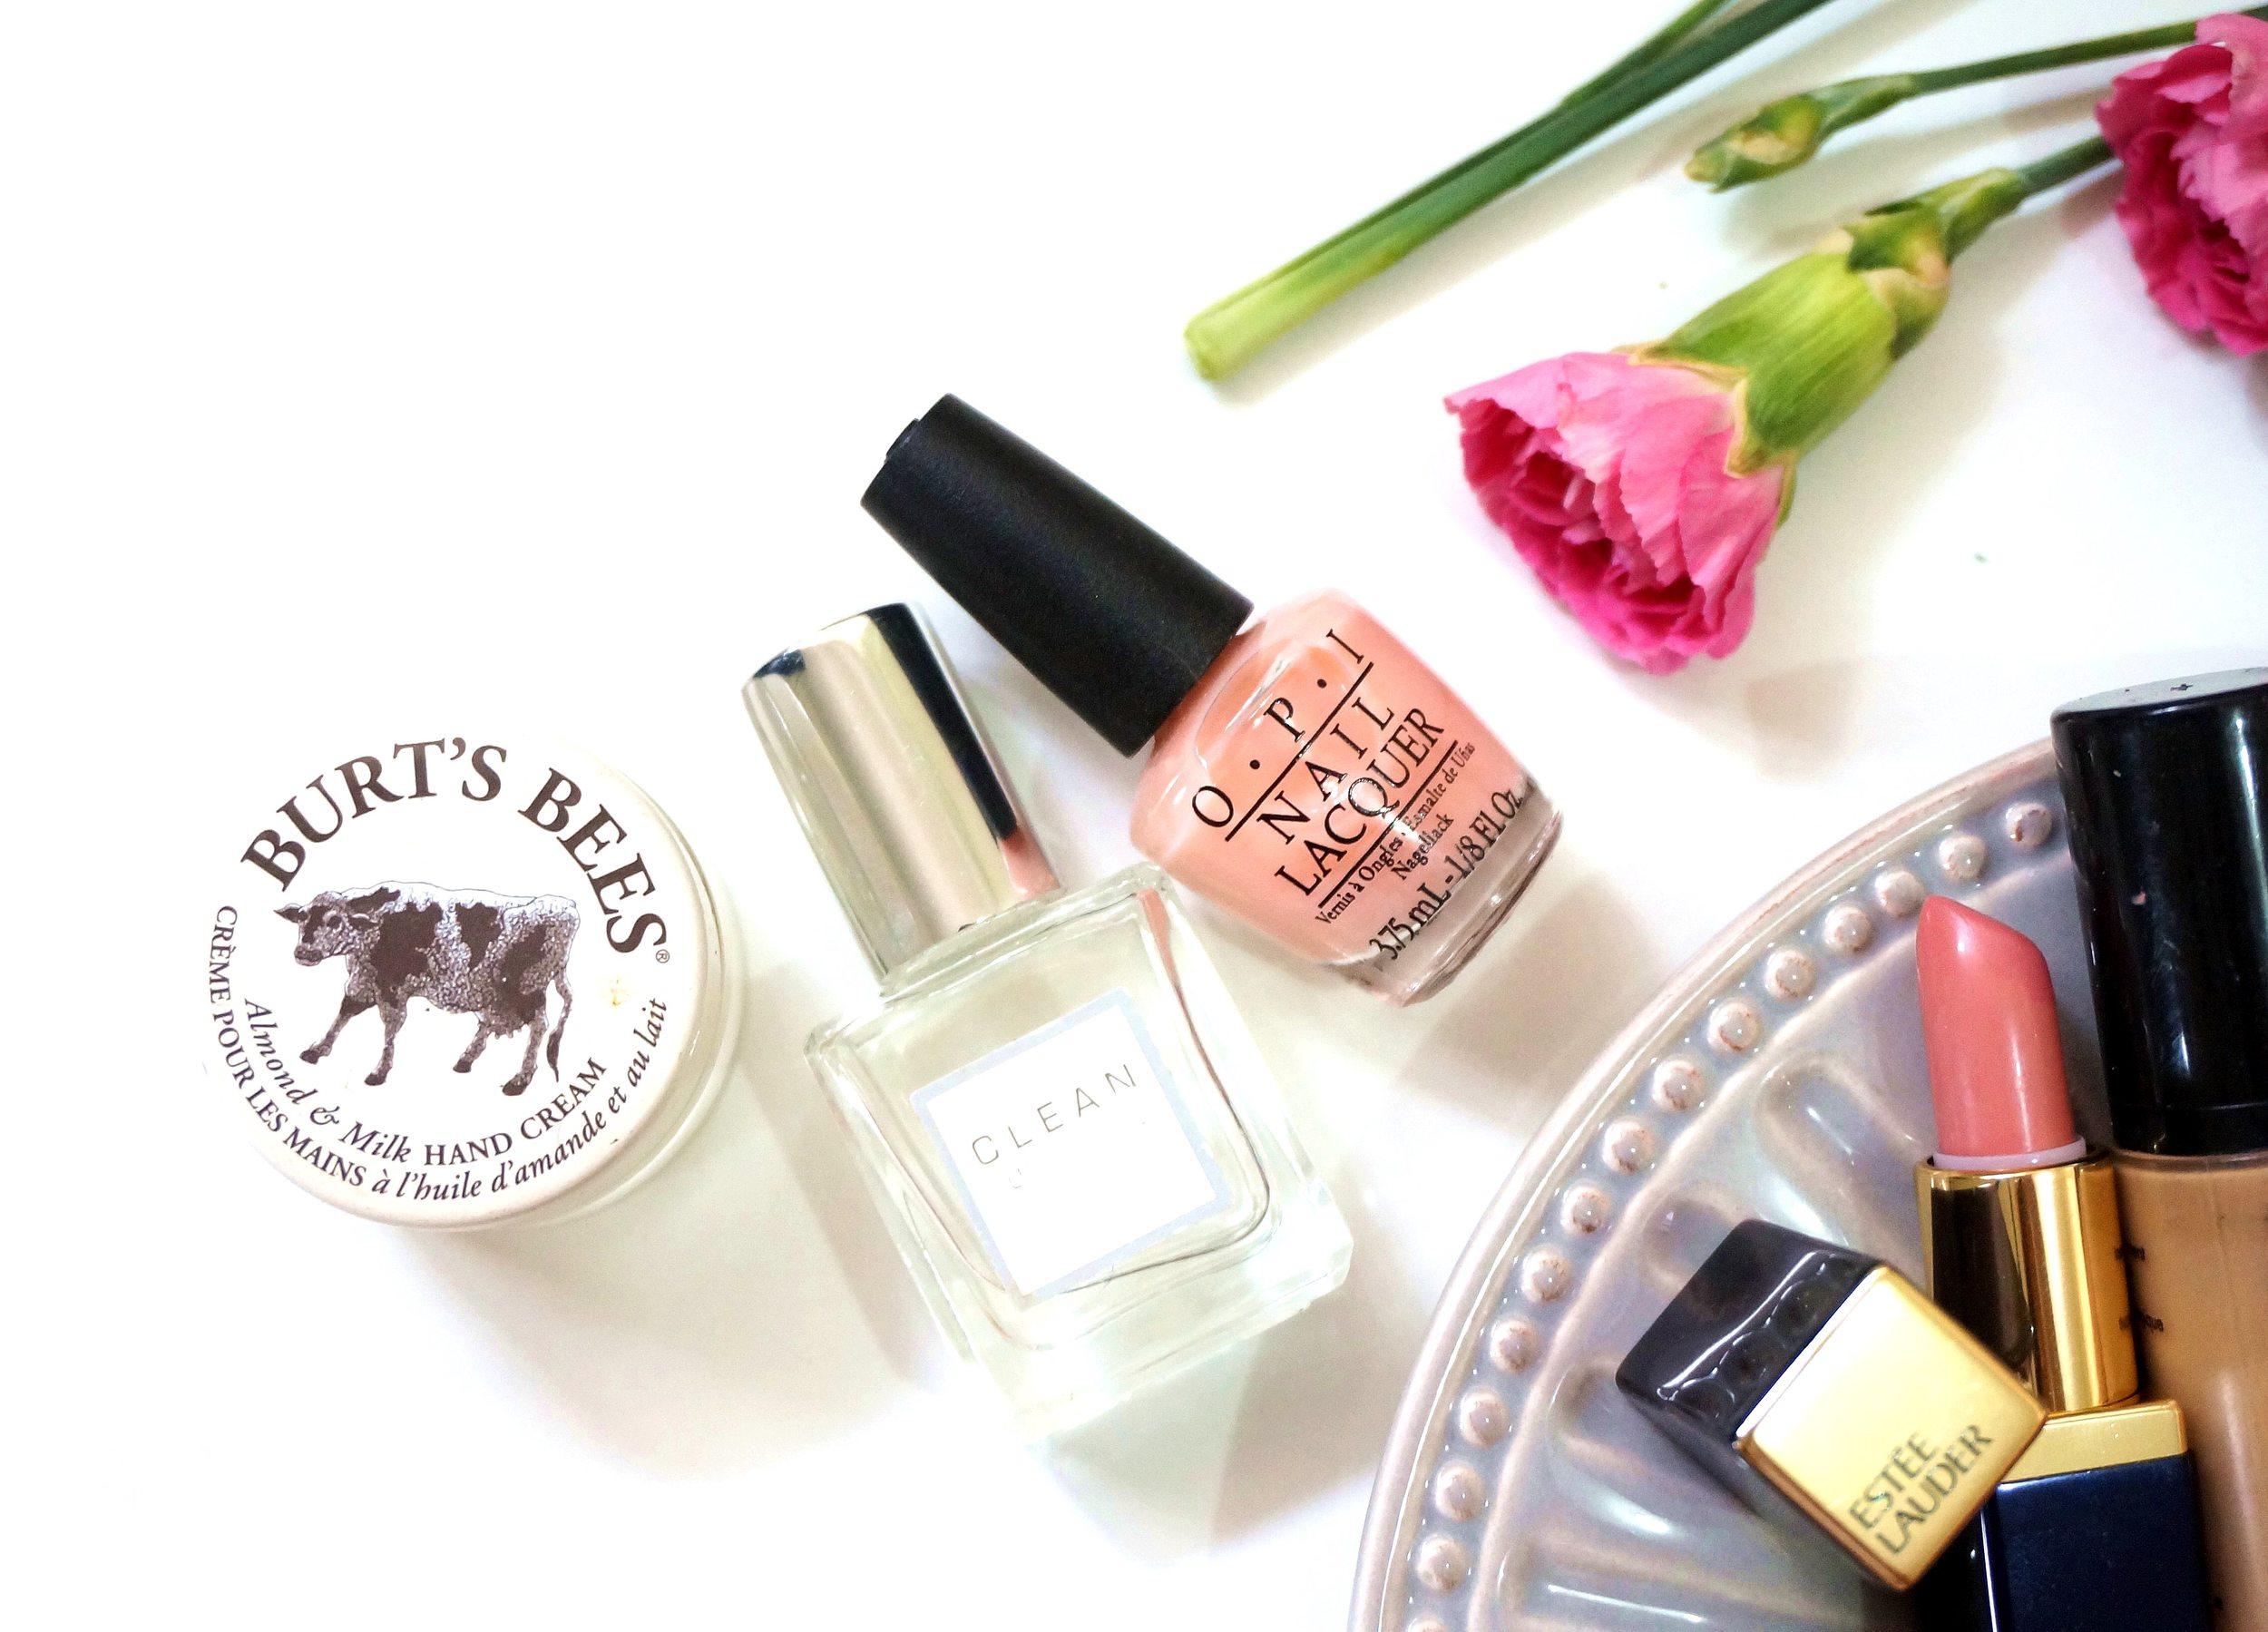 Burt's Bees Almond & Milk Hand Cream, Clean Perfume, and OPI Nail Polish